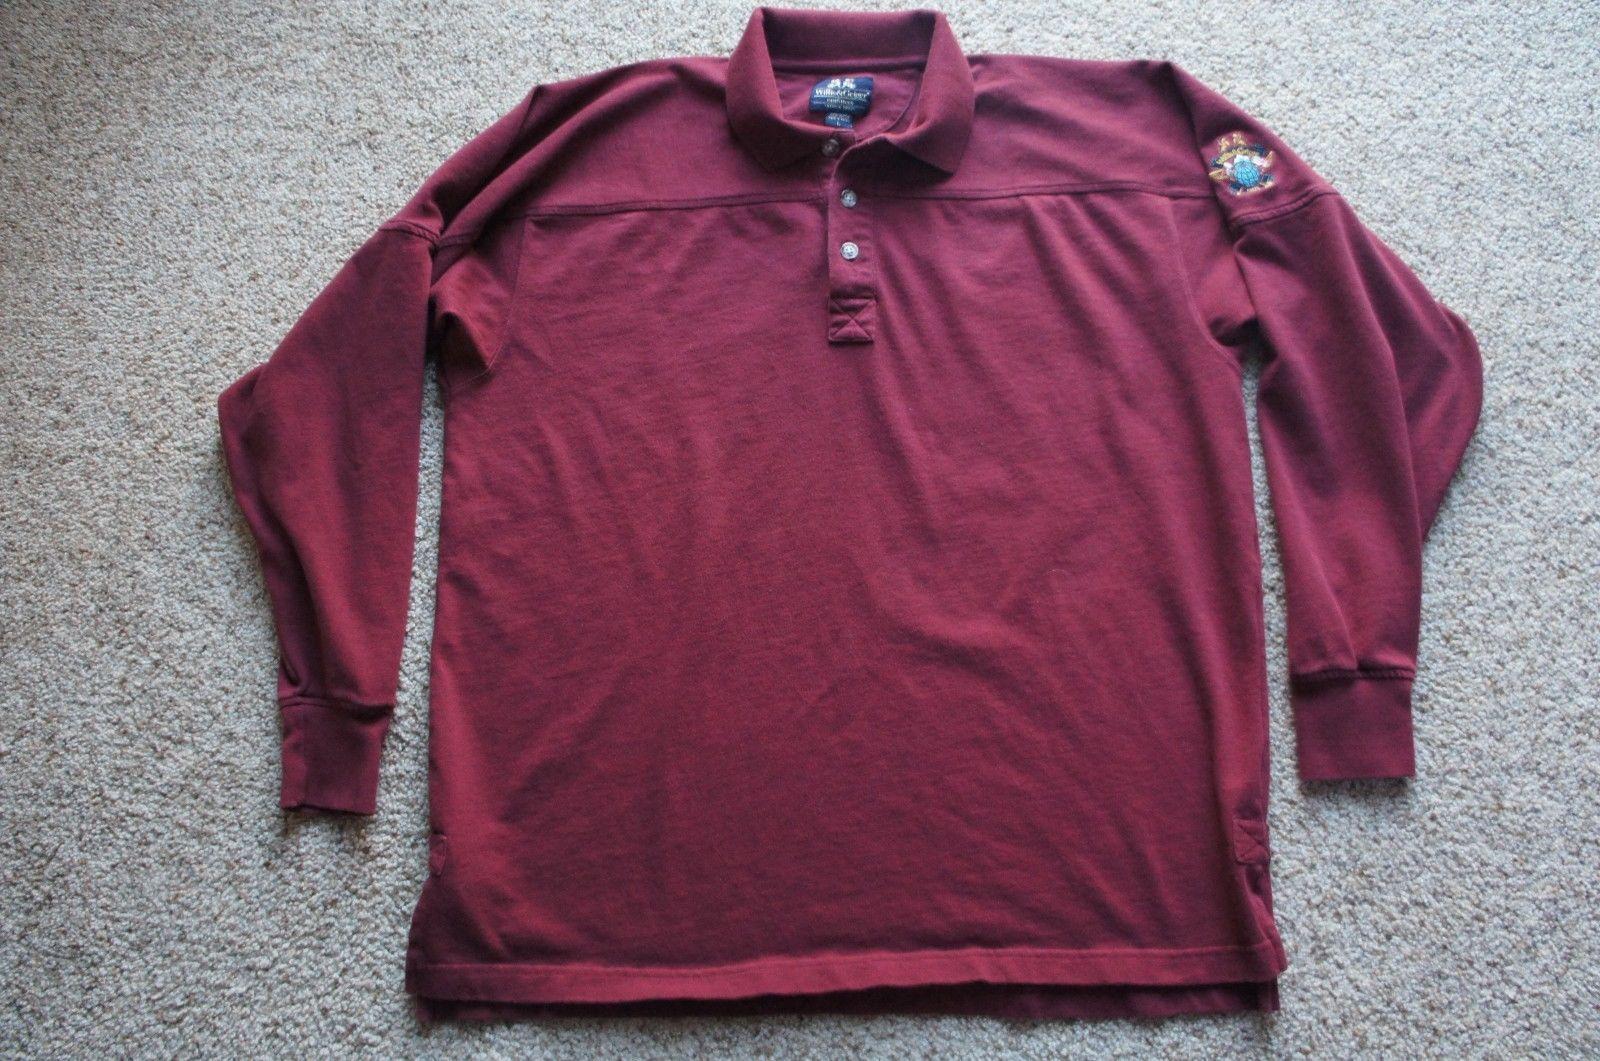 274c29e3b Lot of 3 Sulka Dress Shirts. Blue Solid, Blue Stripe & Green Solid. 15.5 -  16